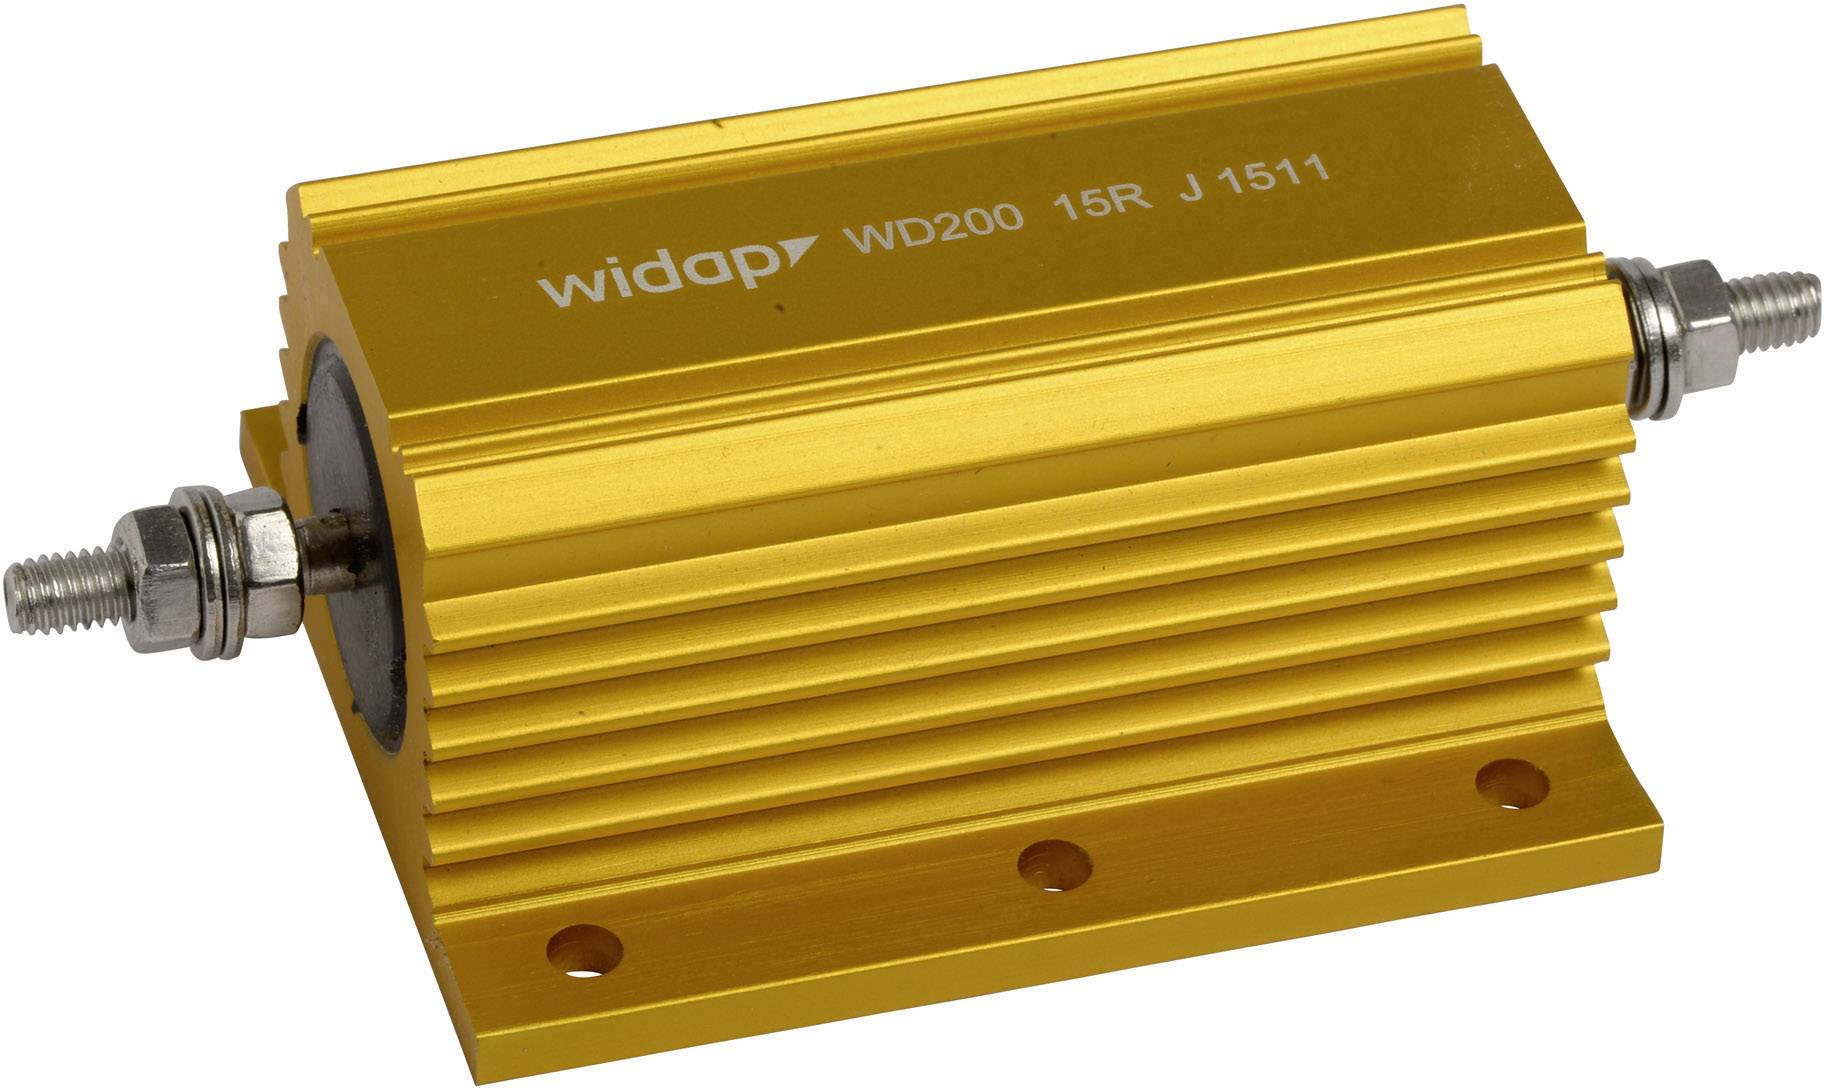 Drôtový rezistor Widap 160151, hodnota odporu 15 Ohm, 200 W, 1 ks